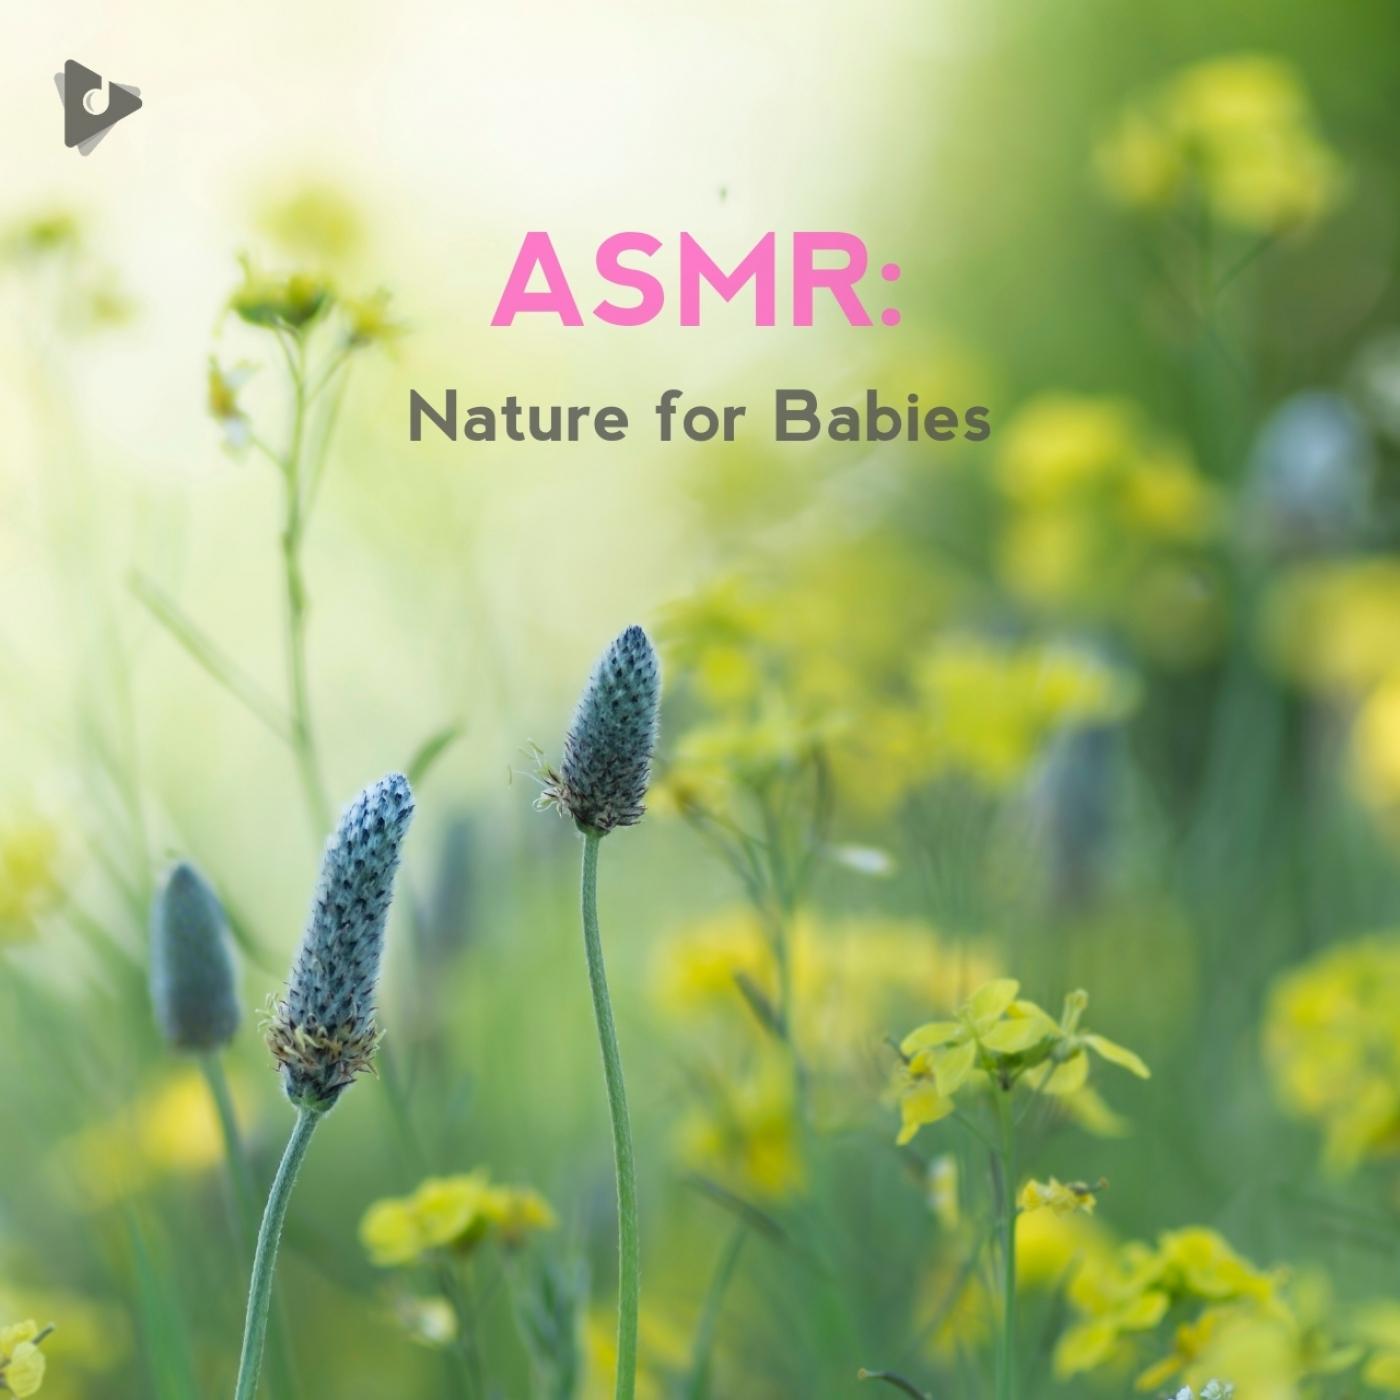 ASMR: Nature for Babies